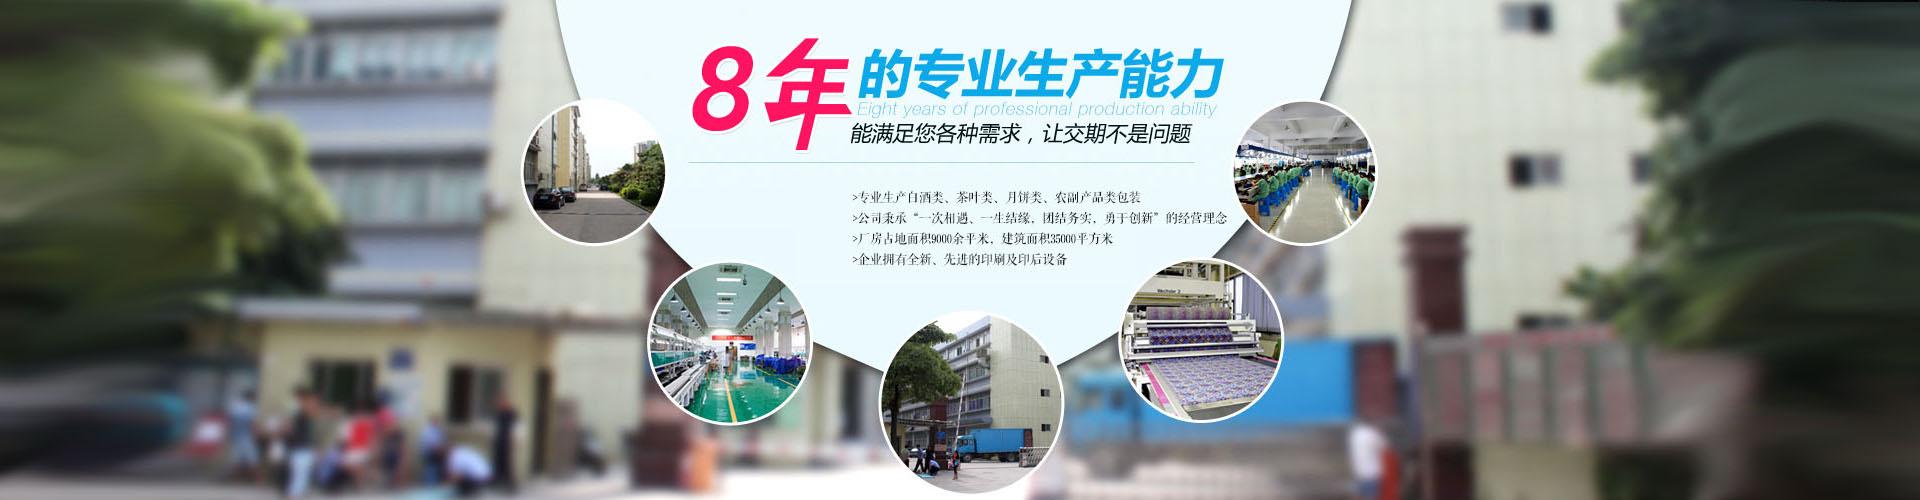 JBO竞博app_竞博电竞dota_JBO竞博电竞网址